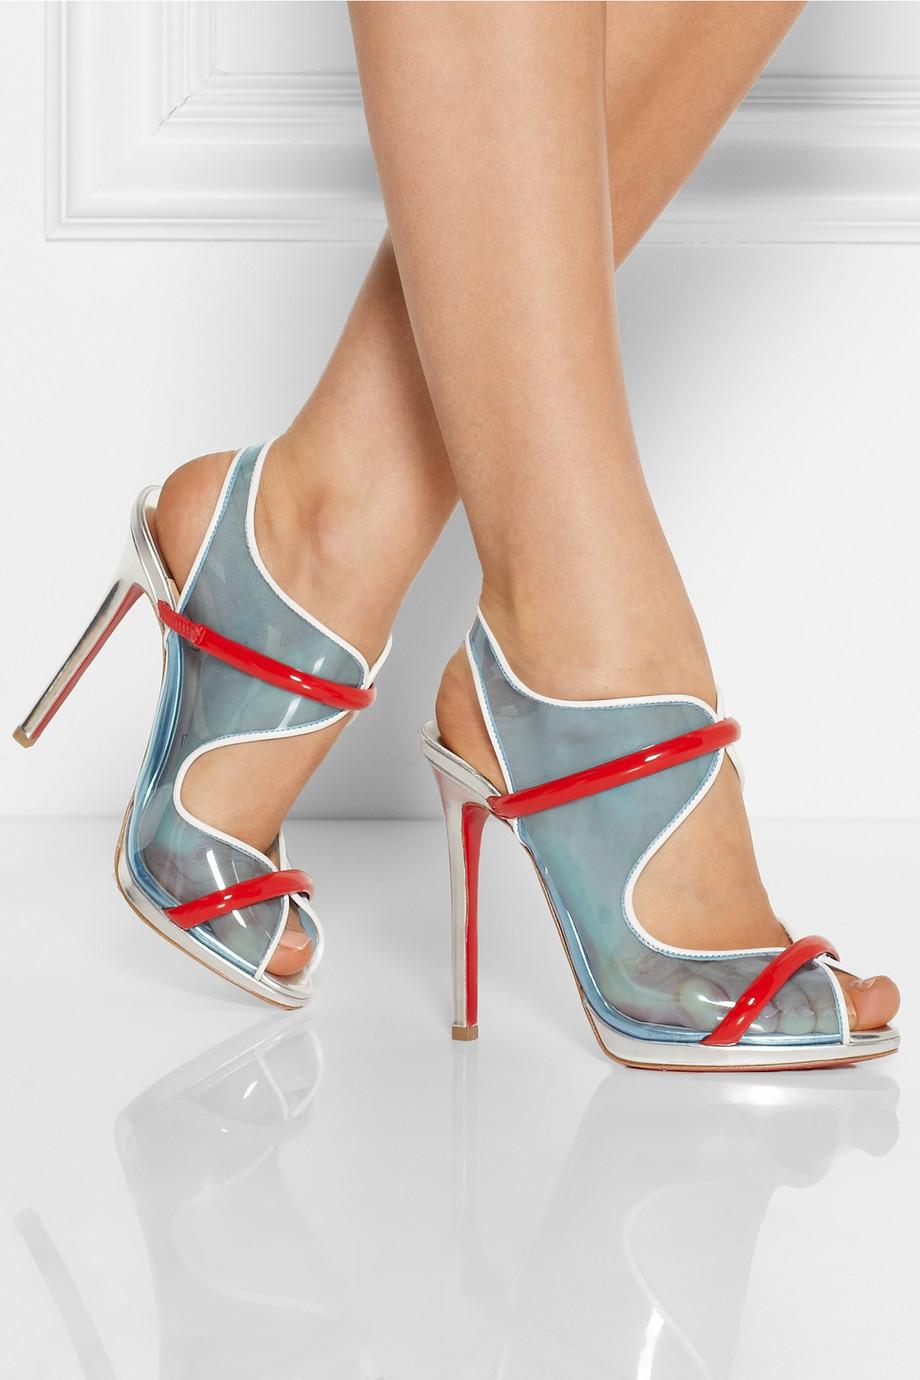 Artesur ? christian louboutin PVC and leather slide sandals